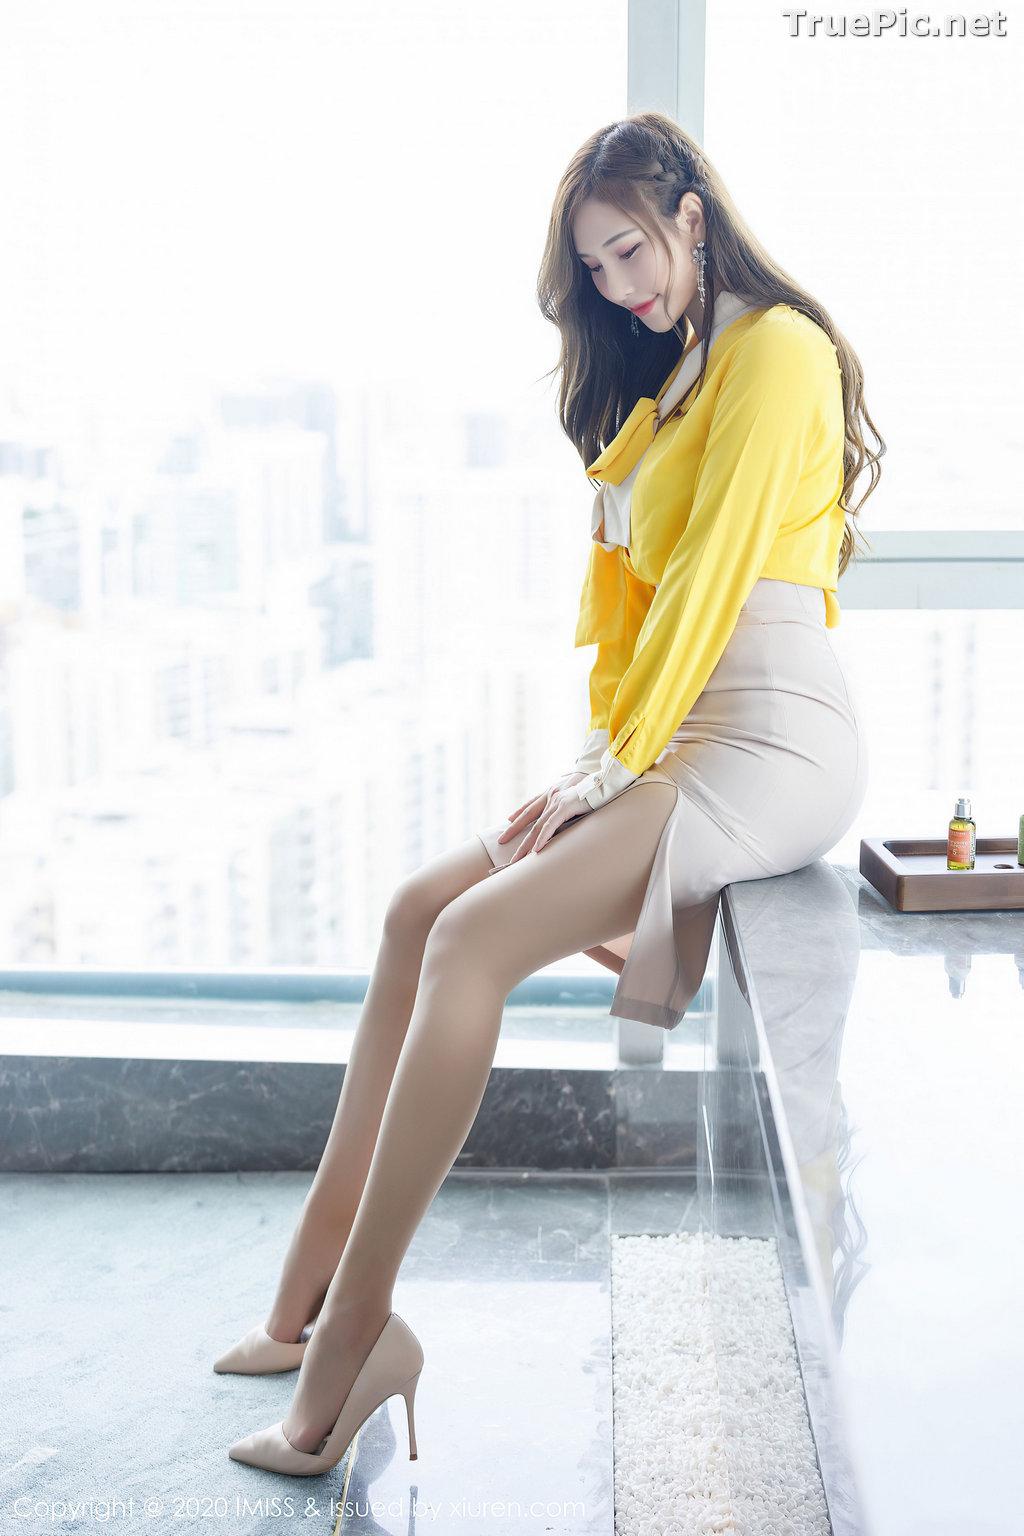 Image IMISS Vol.494 - Chinese Model - Lavinia肉肉 - Beautiful Long Legs Secretary - TruePic.net - Picture-8